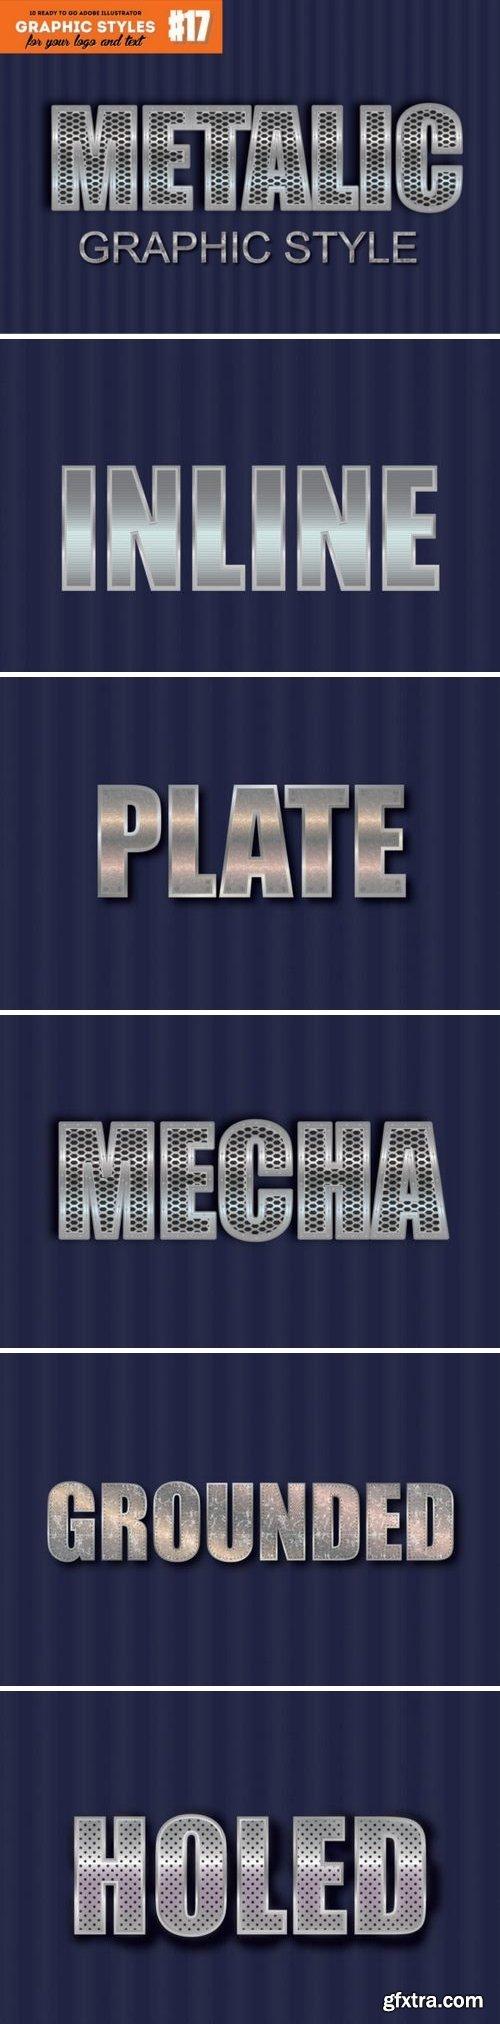 10 Metal / Chrome Graphic Style for Adobe Illustrator